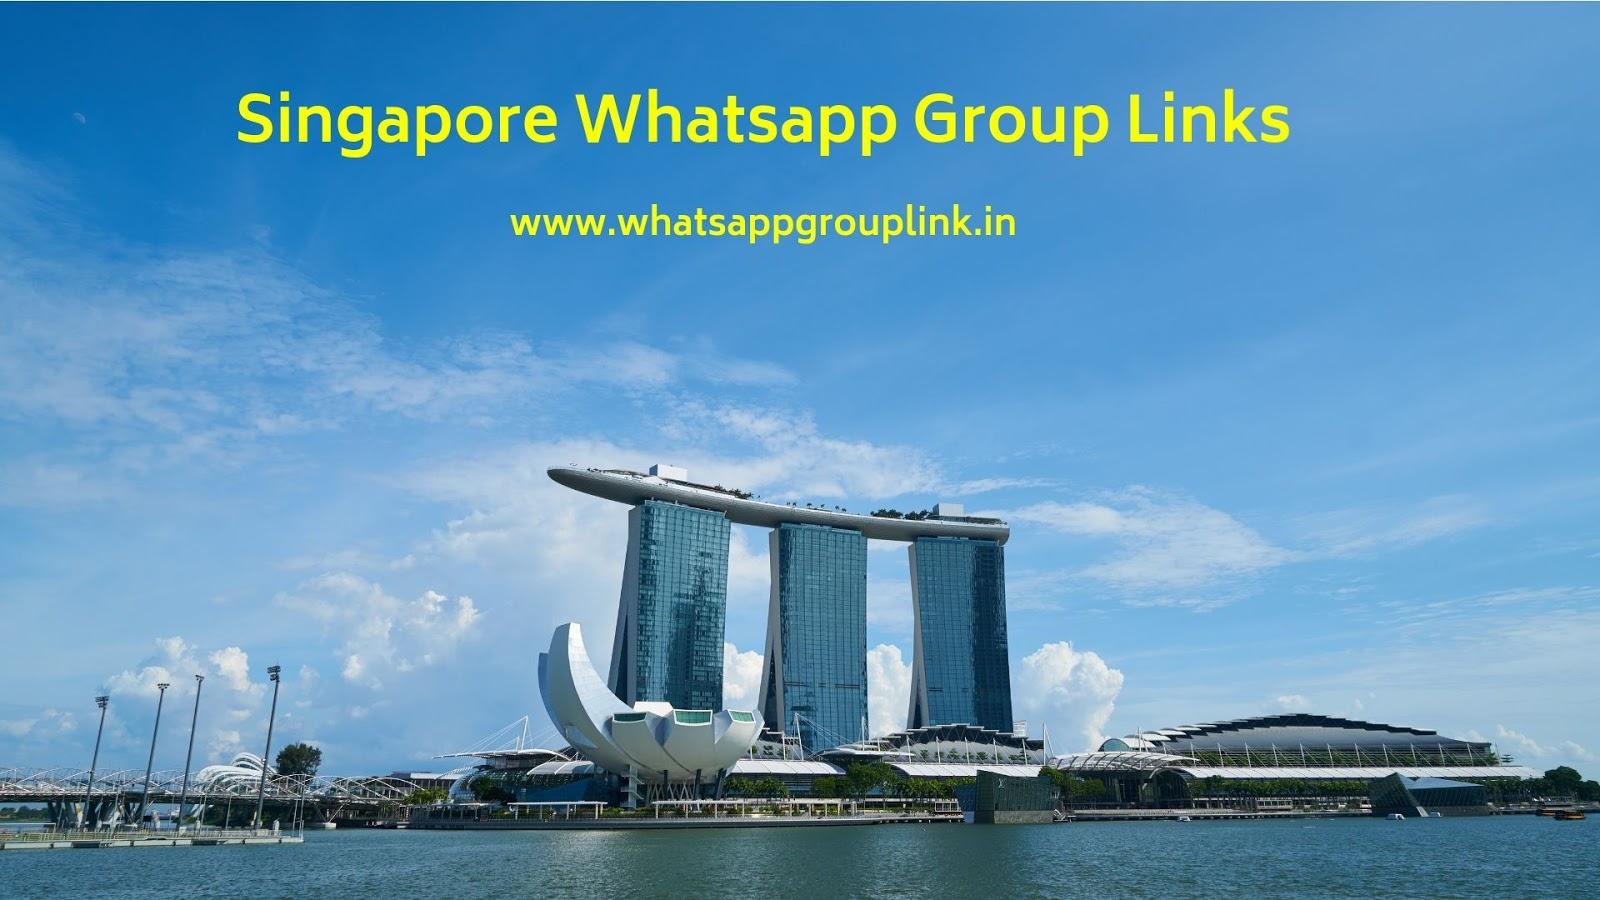 Whatsapp Group Link: Singapore Whatsapp Group Links